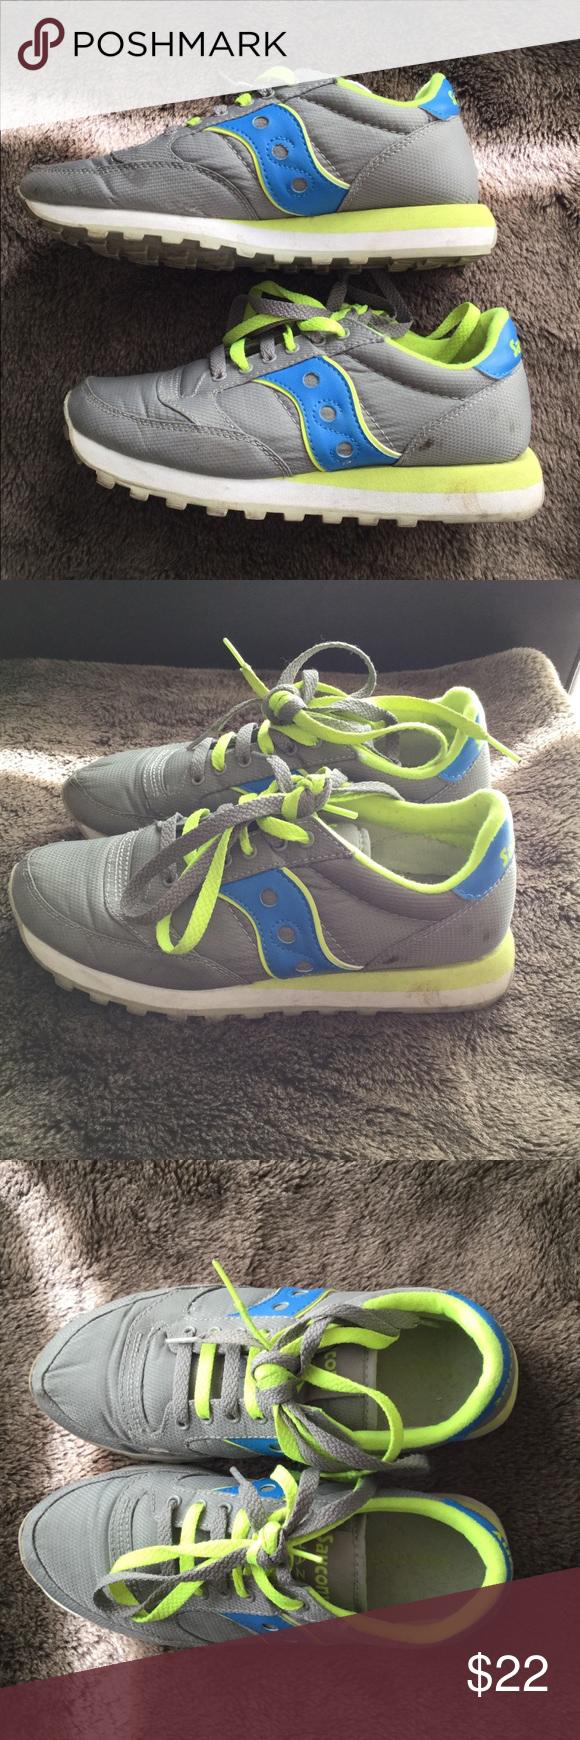 Jazz sneakers, Saucony shoes